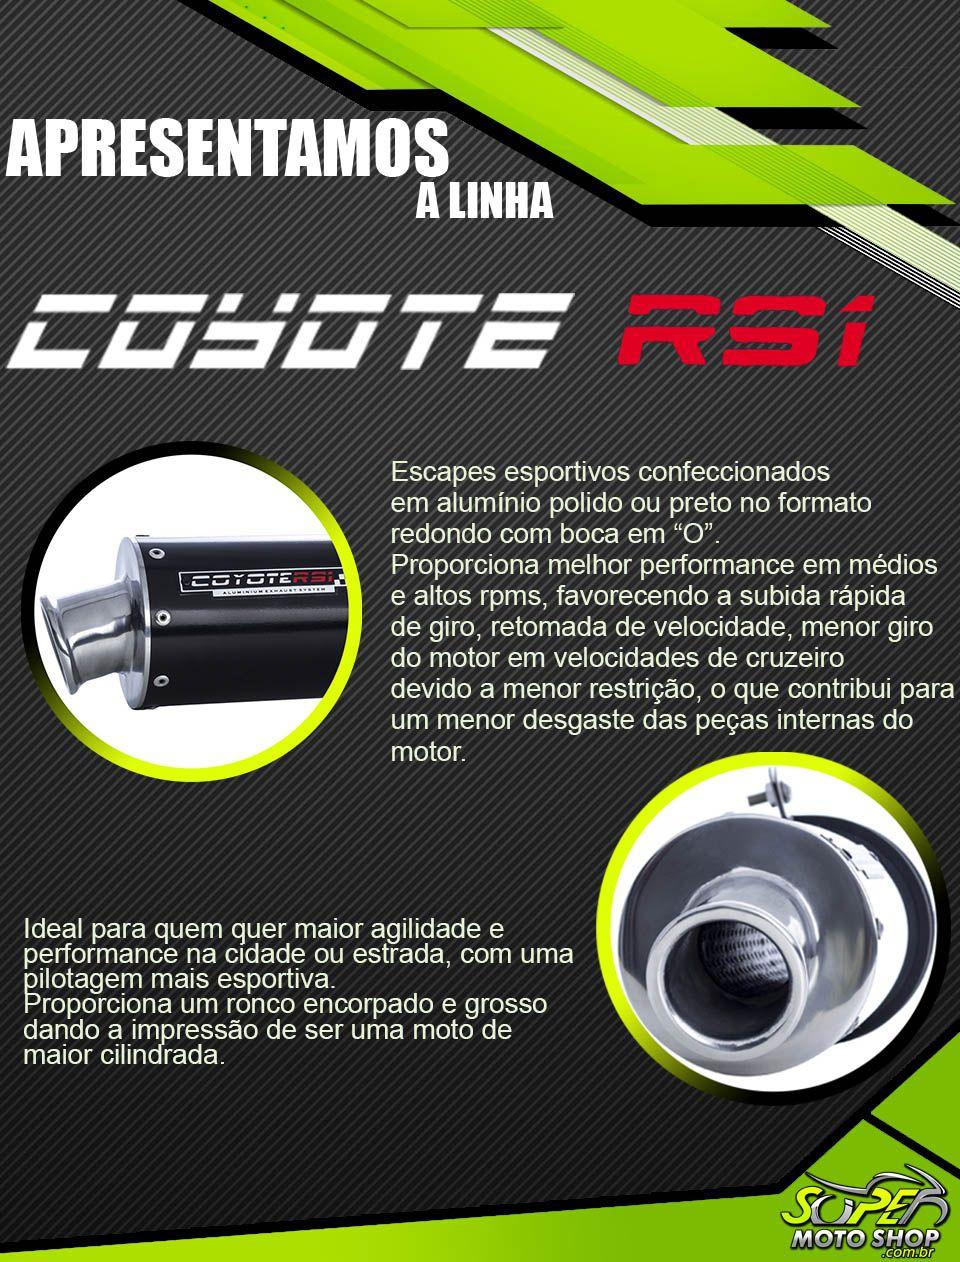 Escape / Ponteira Coyote RS1 Aluminio Redondo - Bandit N/S 1200 ano 2007/2008 - Suzuki